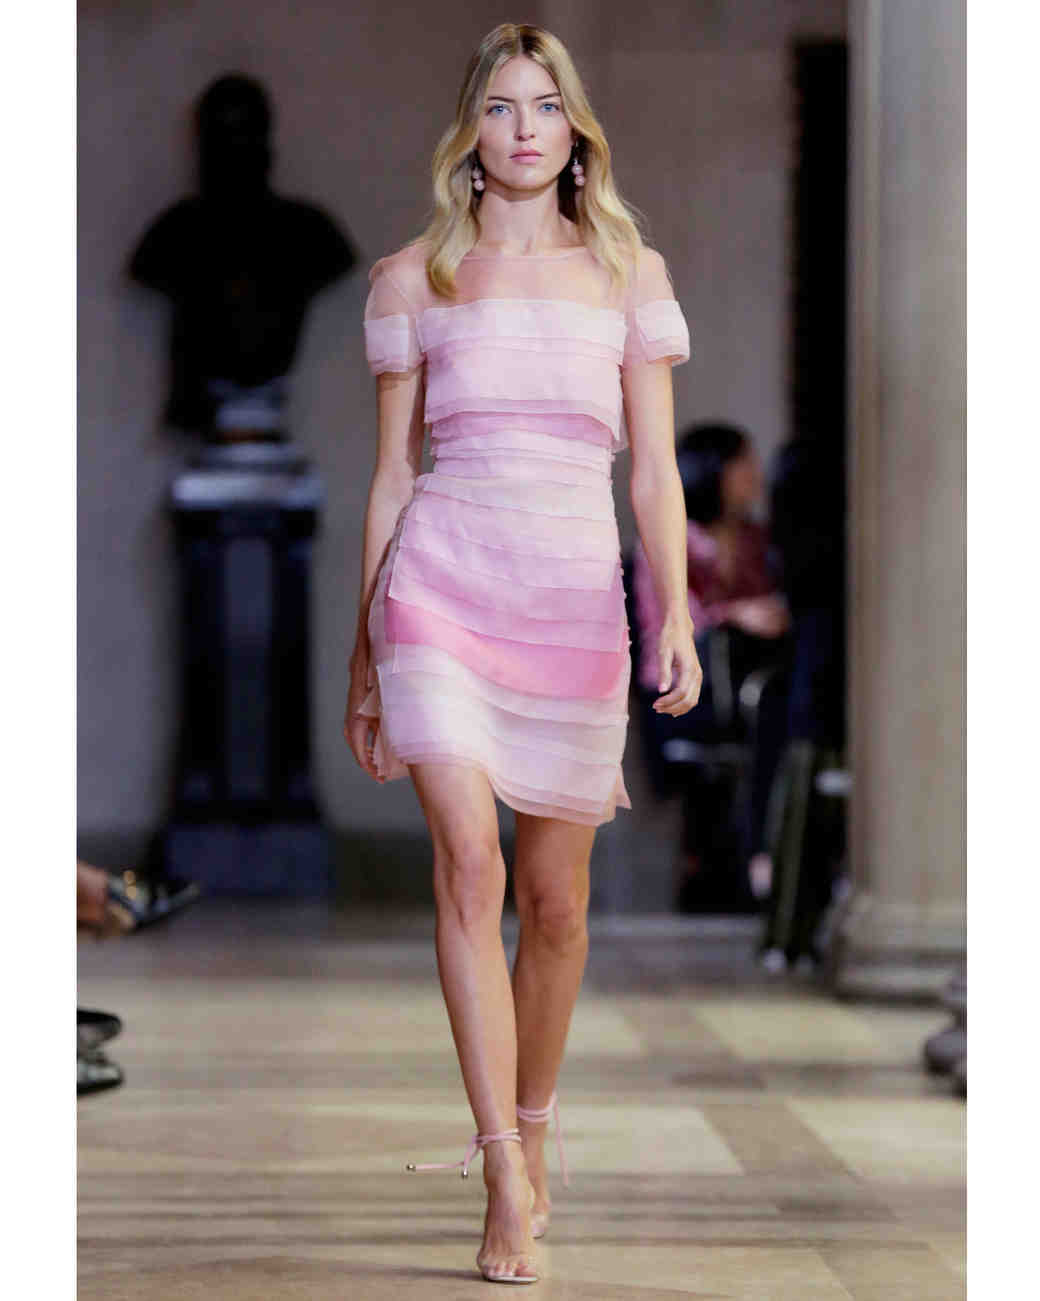 nyfw-sp16-carolina-herrera-pink-mini-dress-0915.jpg